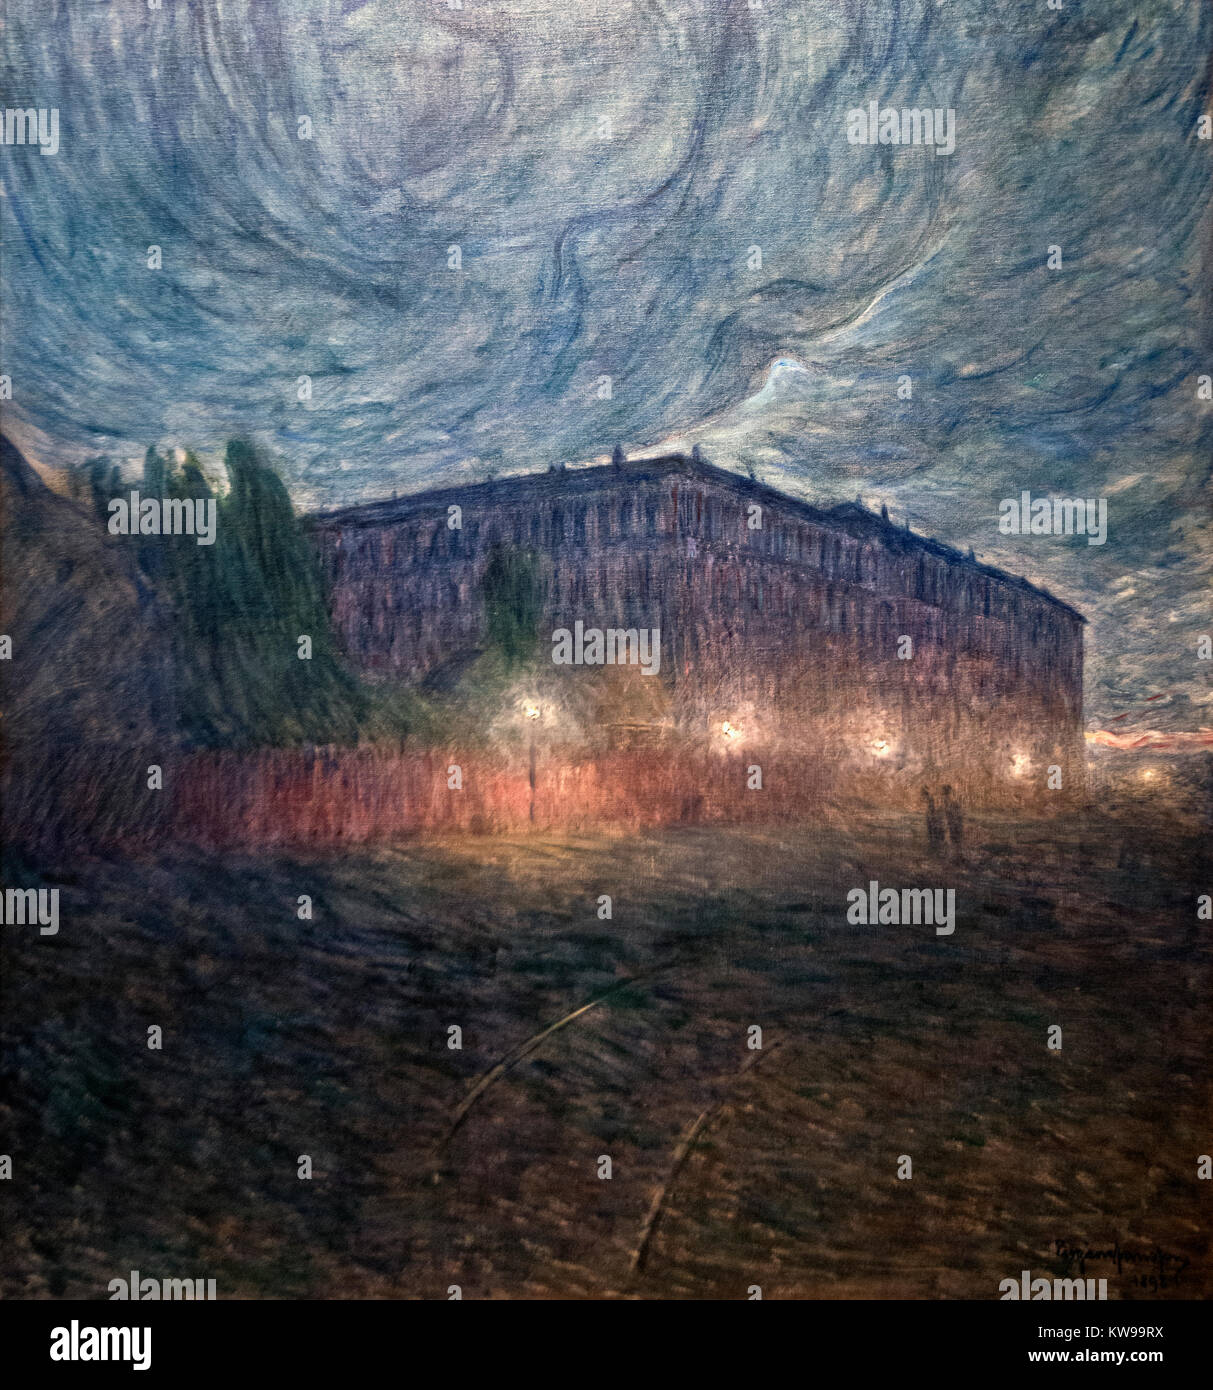 Eugène Jansson: 'Stormy Night' (1898) - Stock Image